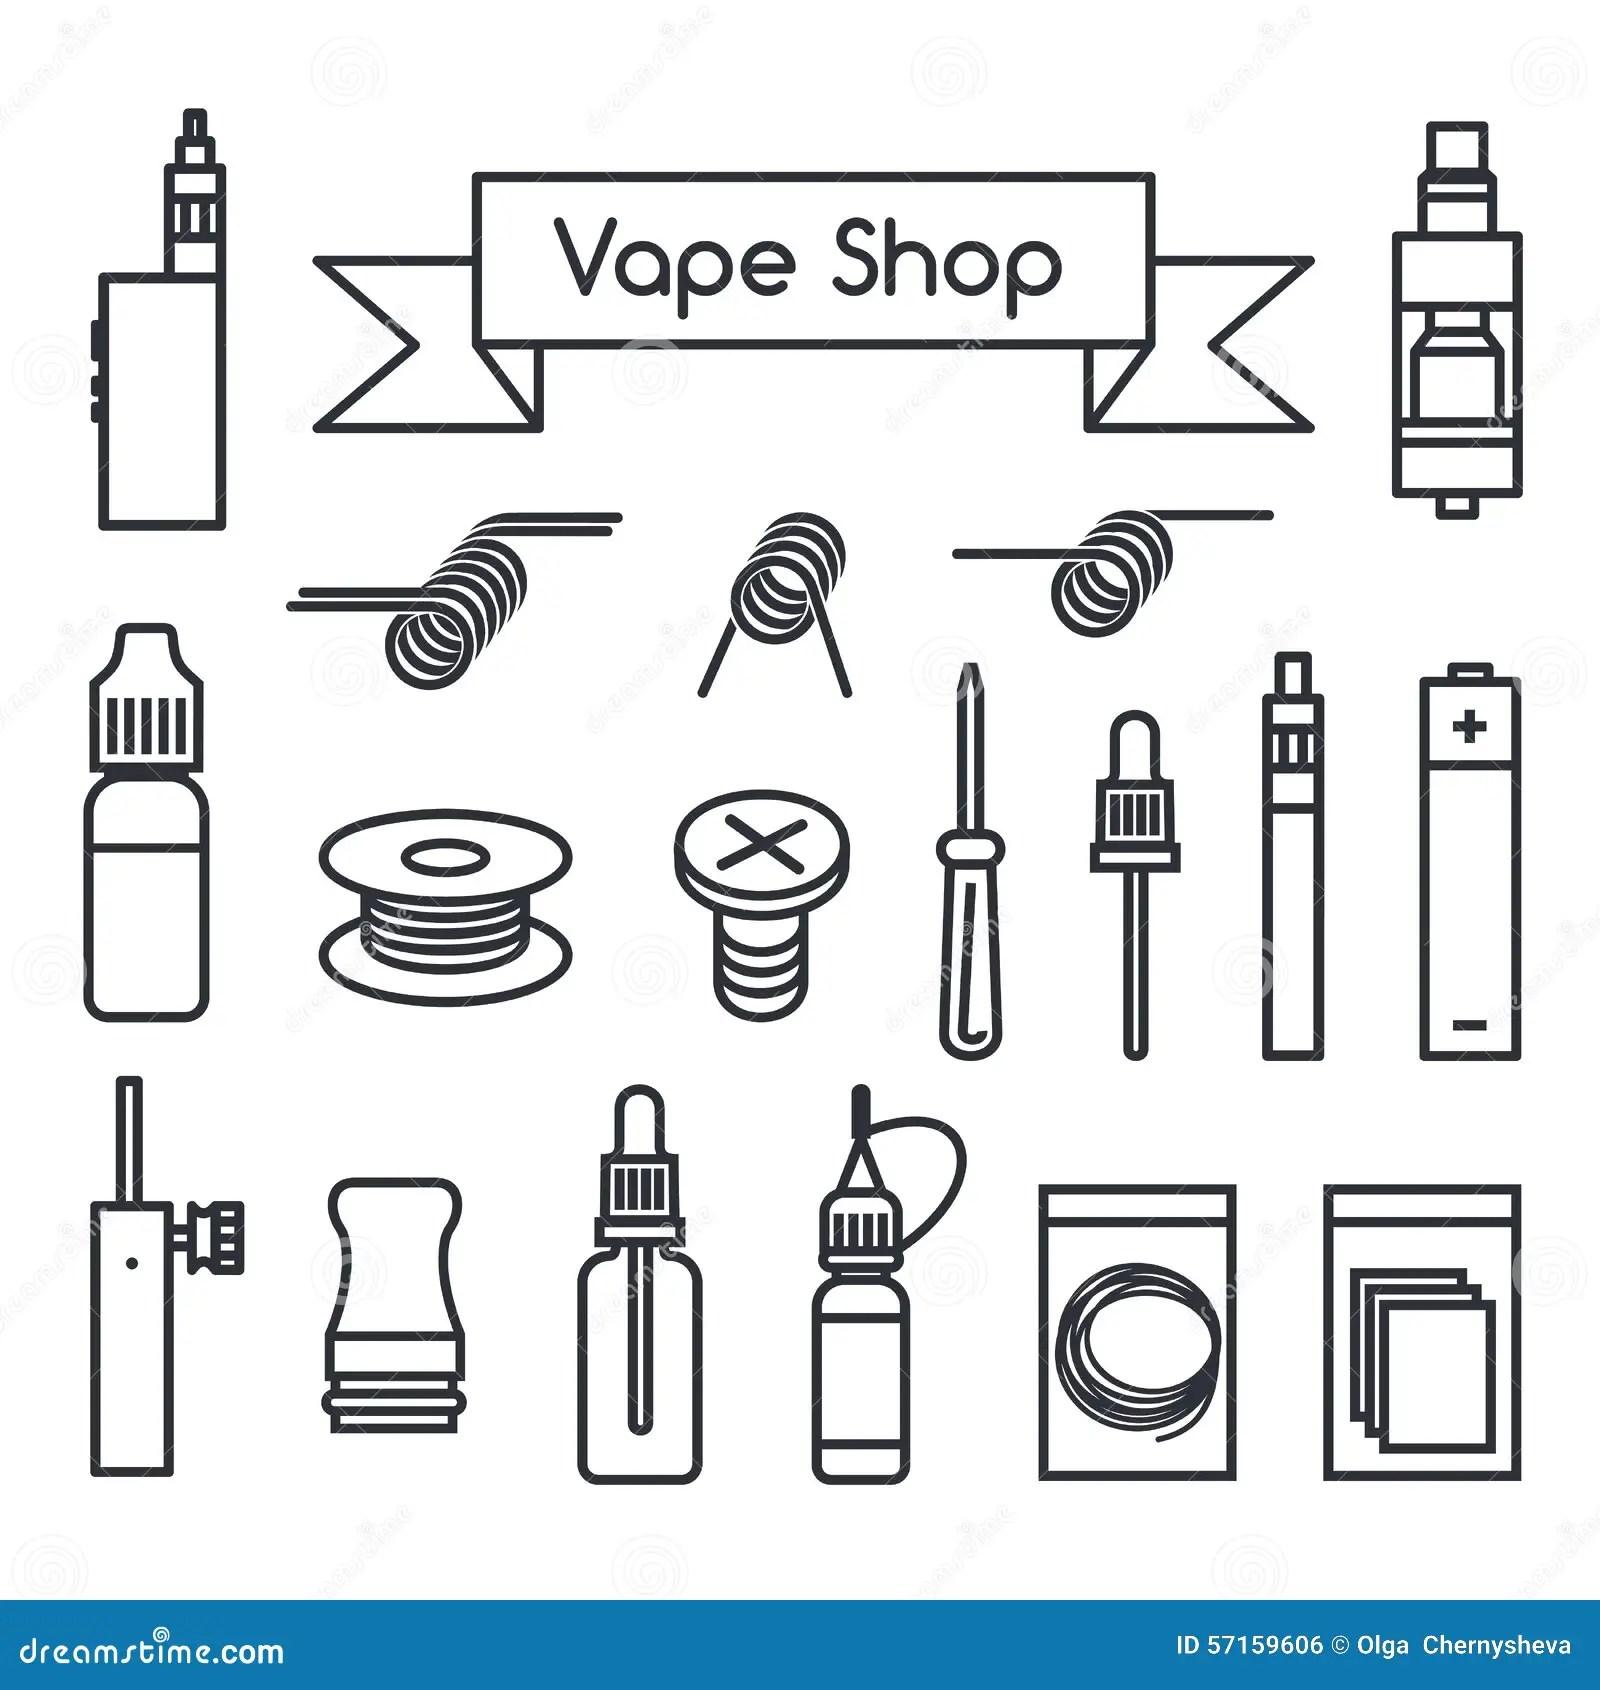 Vape Shop Icons Stock Vector